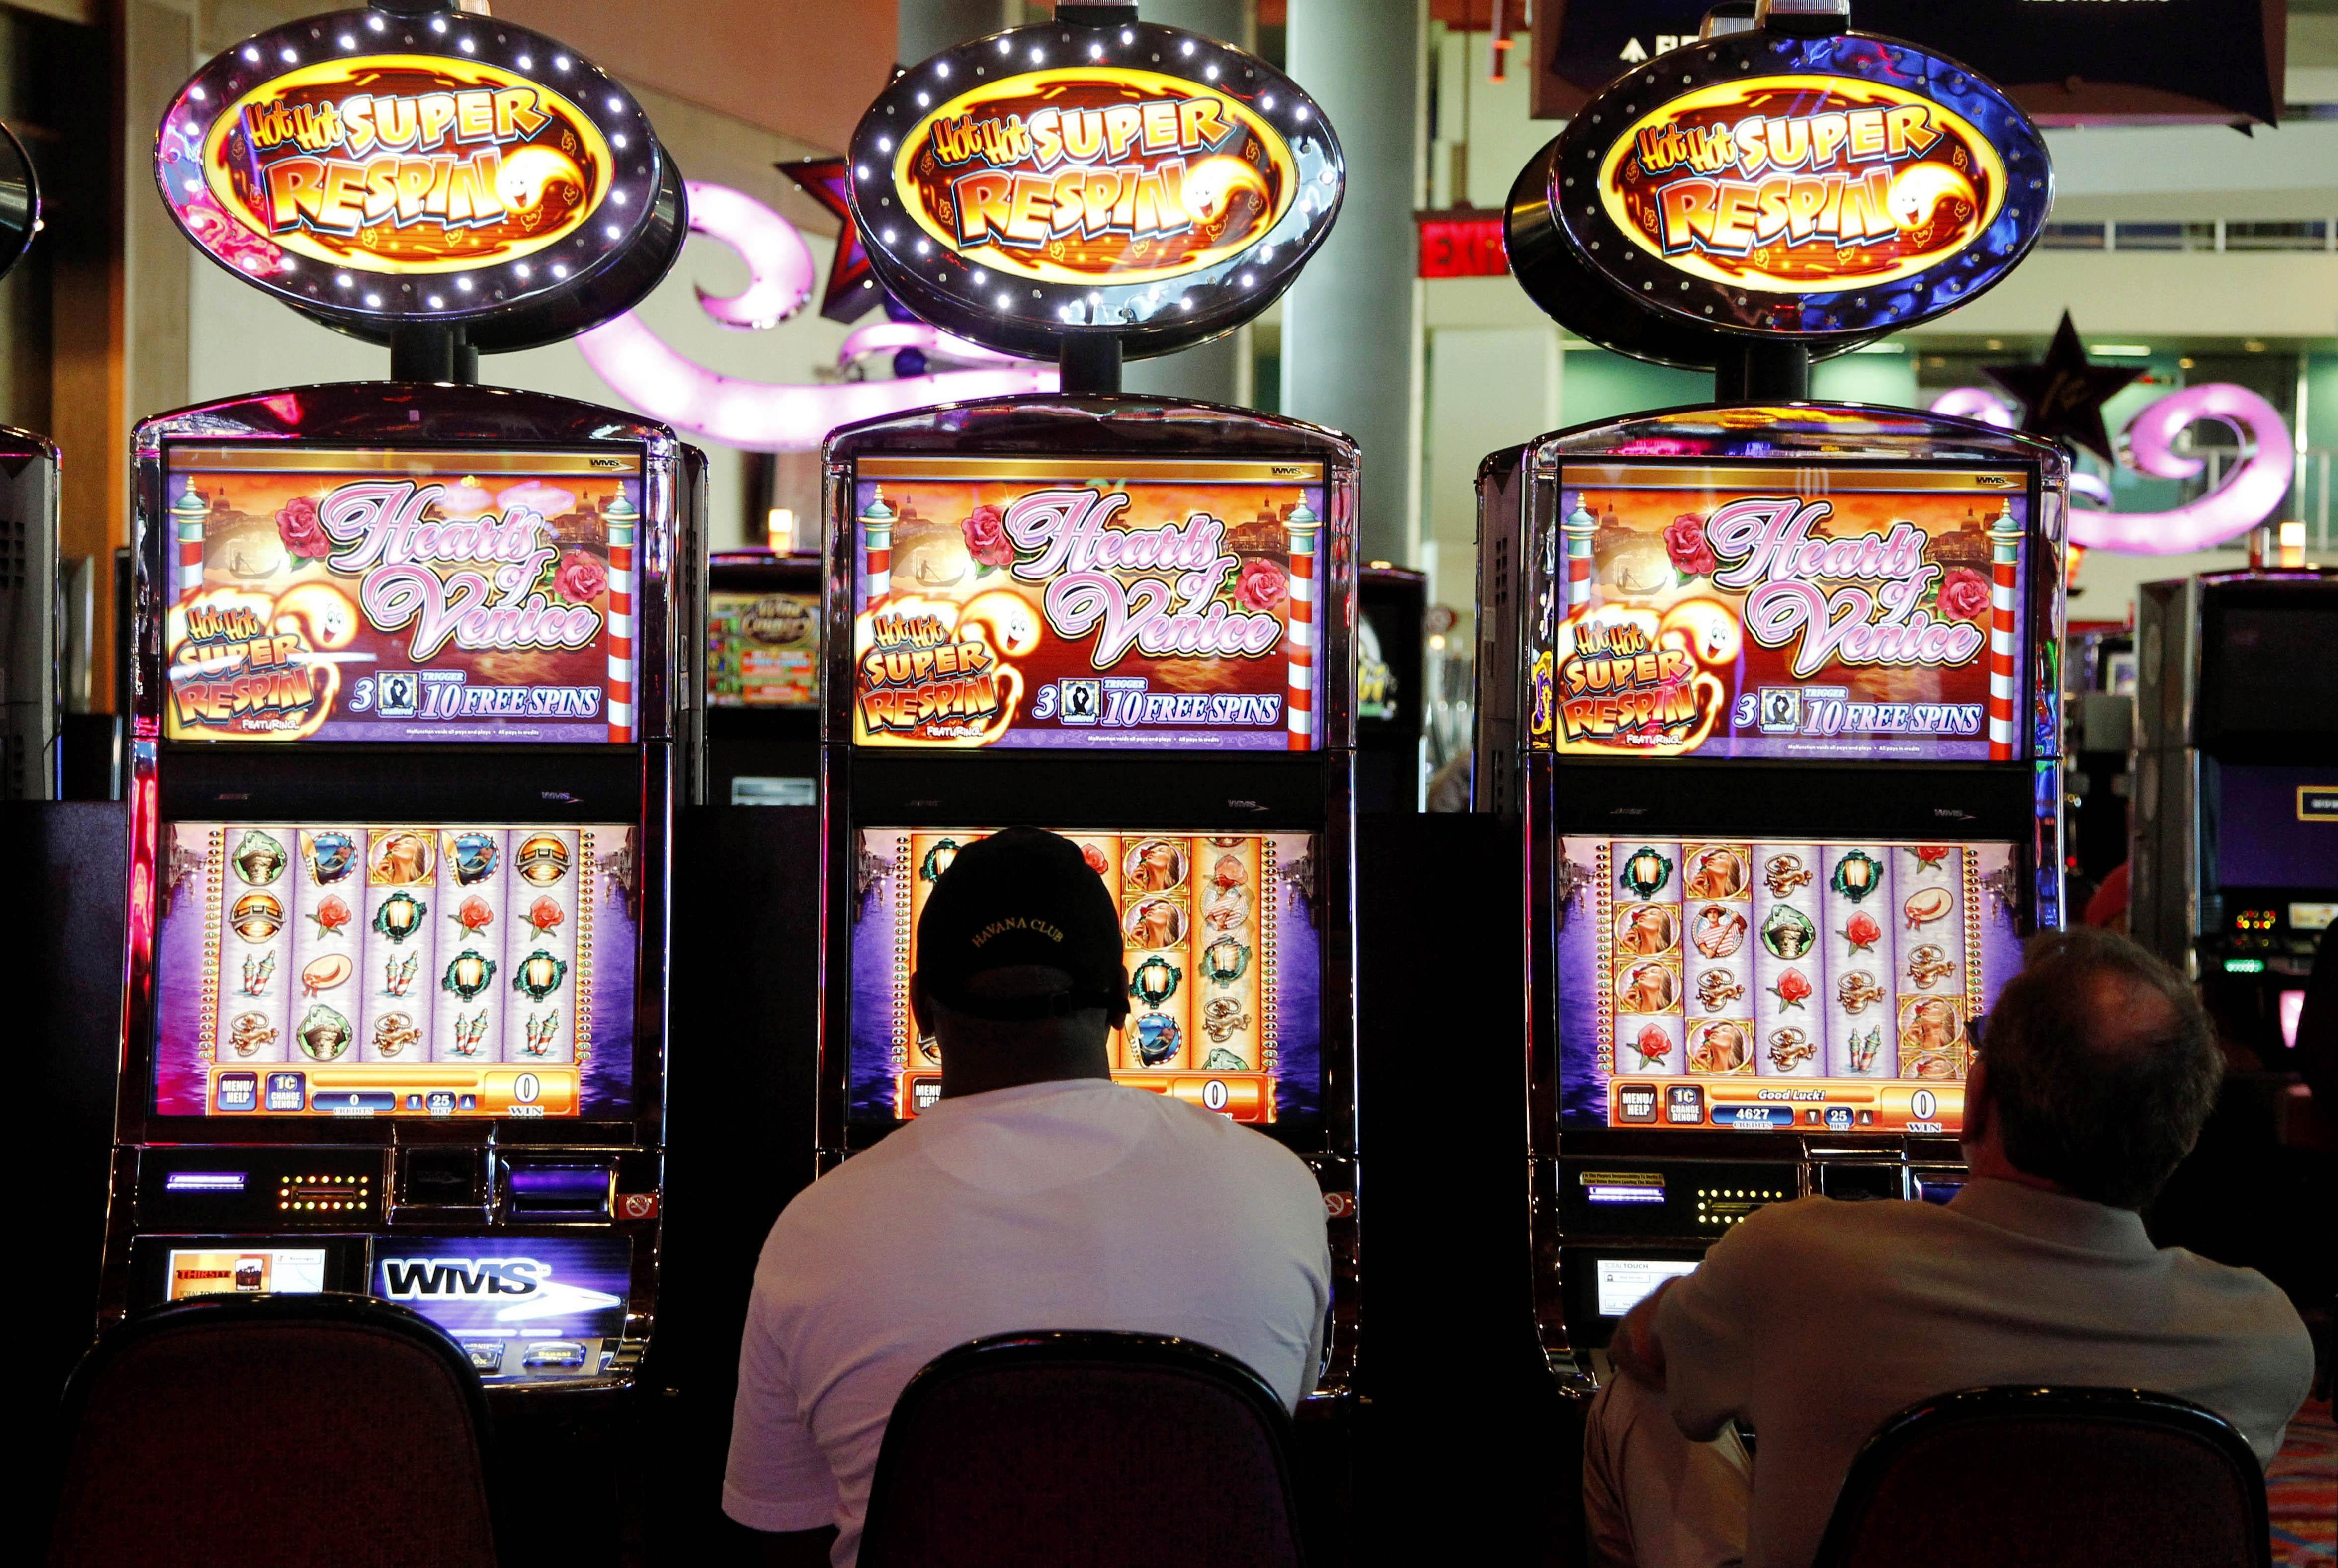 €600 casino chip at Sloto'Cash